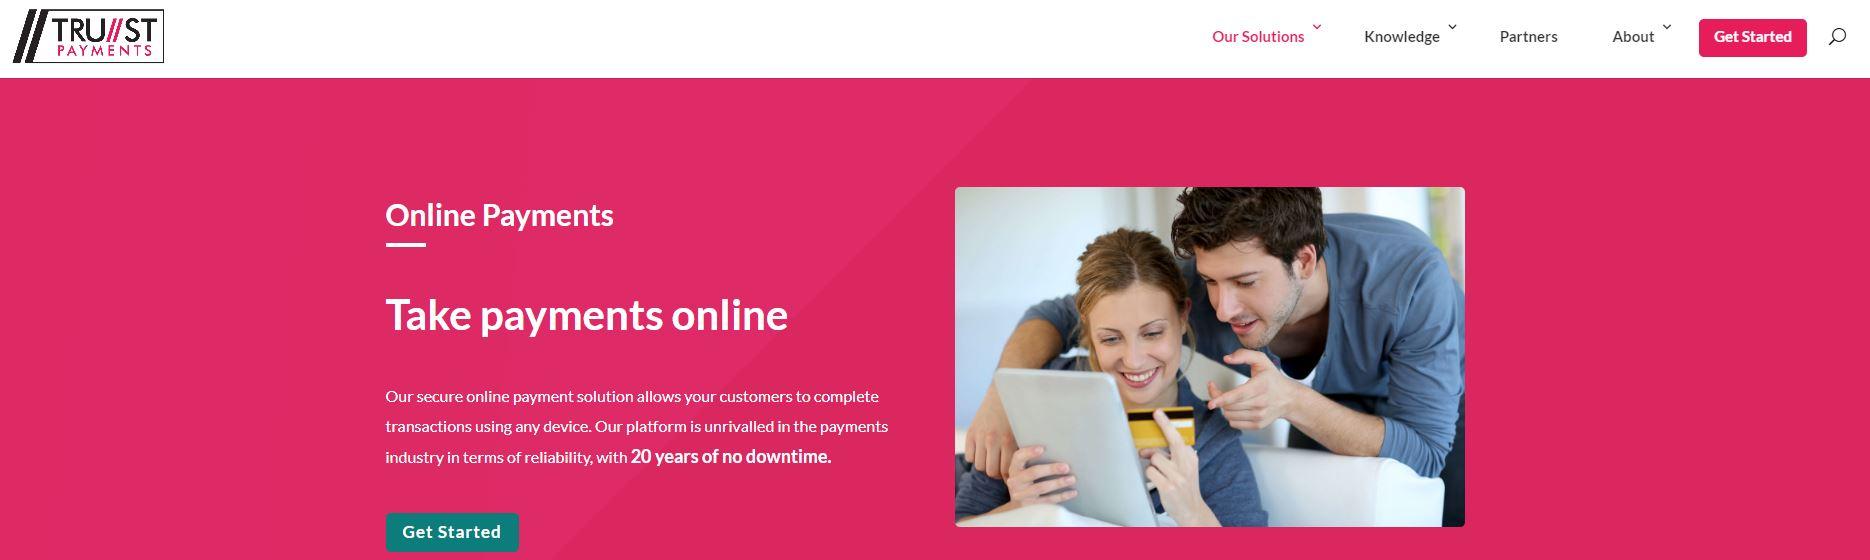 Trust Payments website